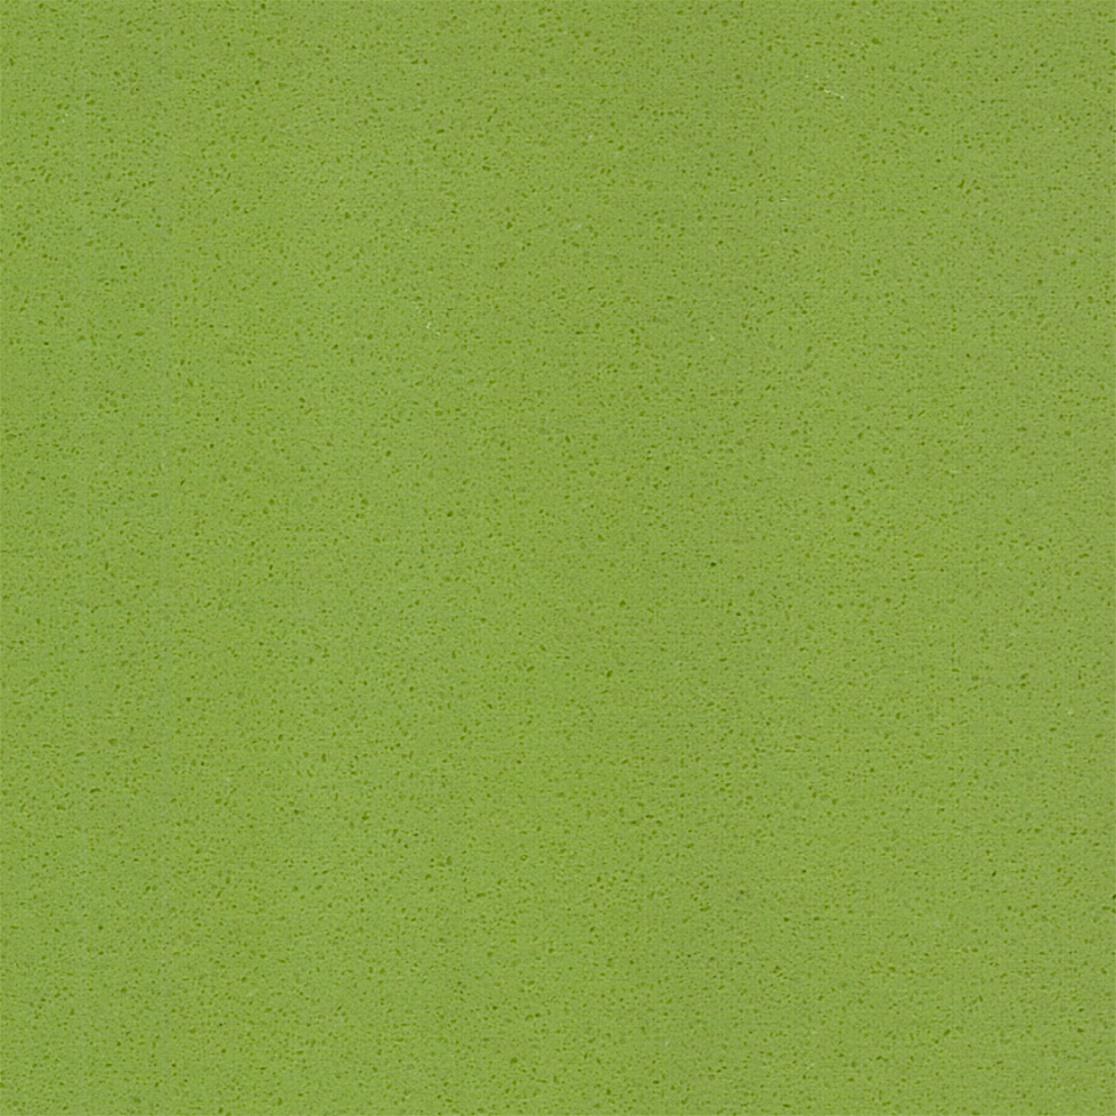 Apple green engineered quartz stone